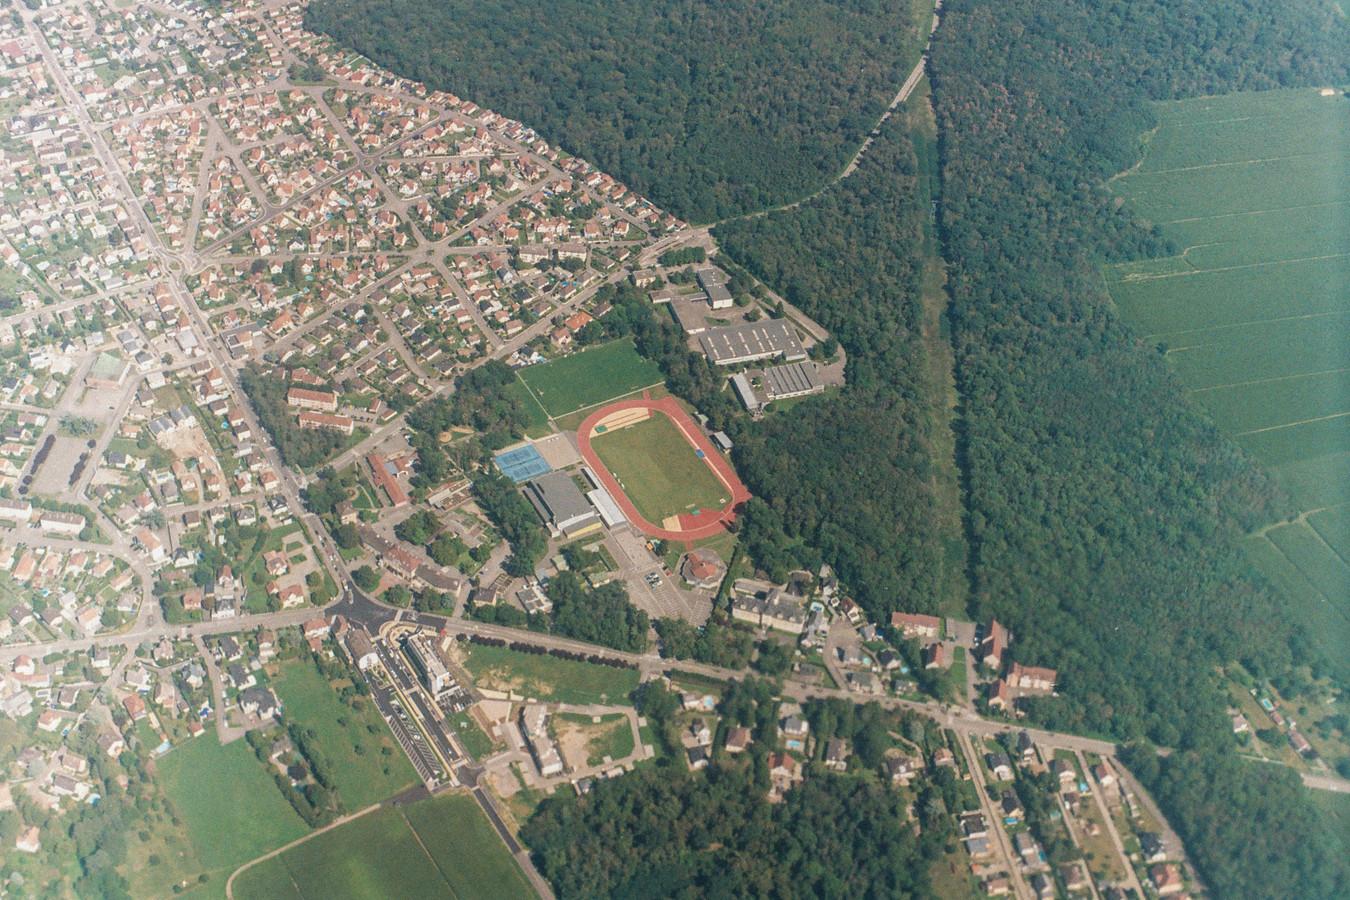 Aerial of a football field near Basel